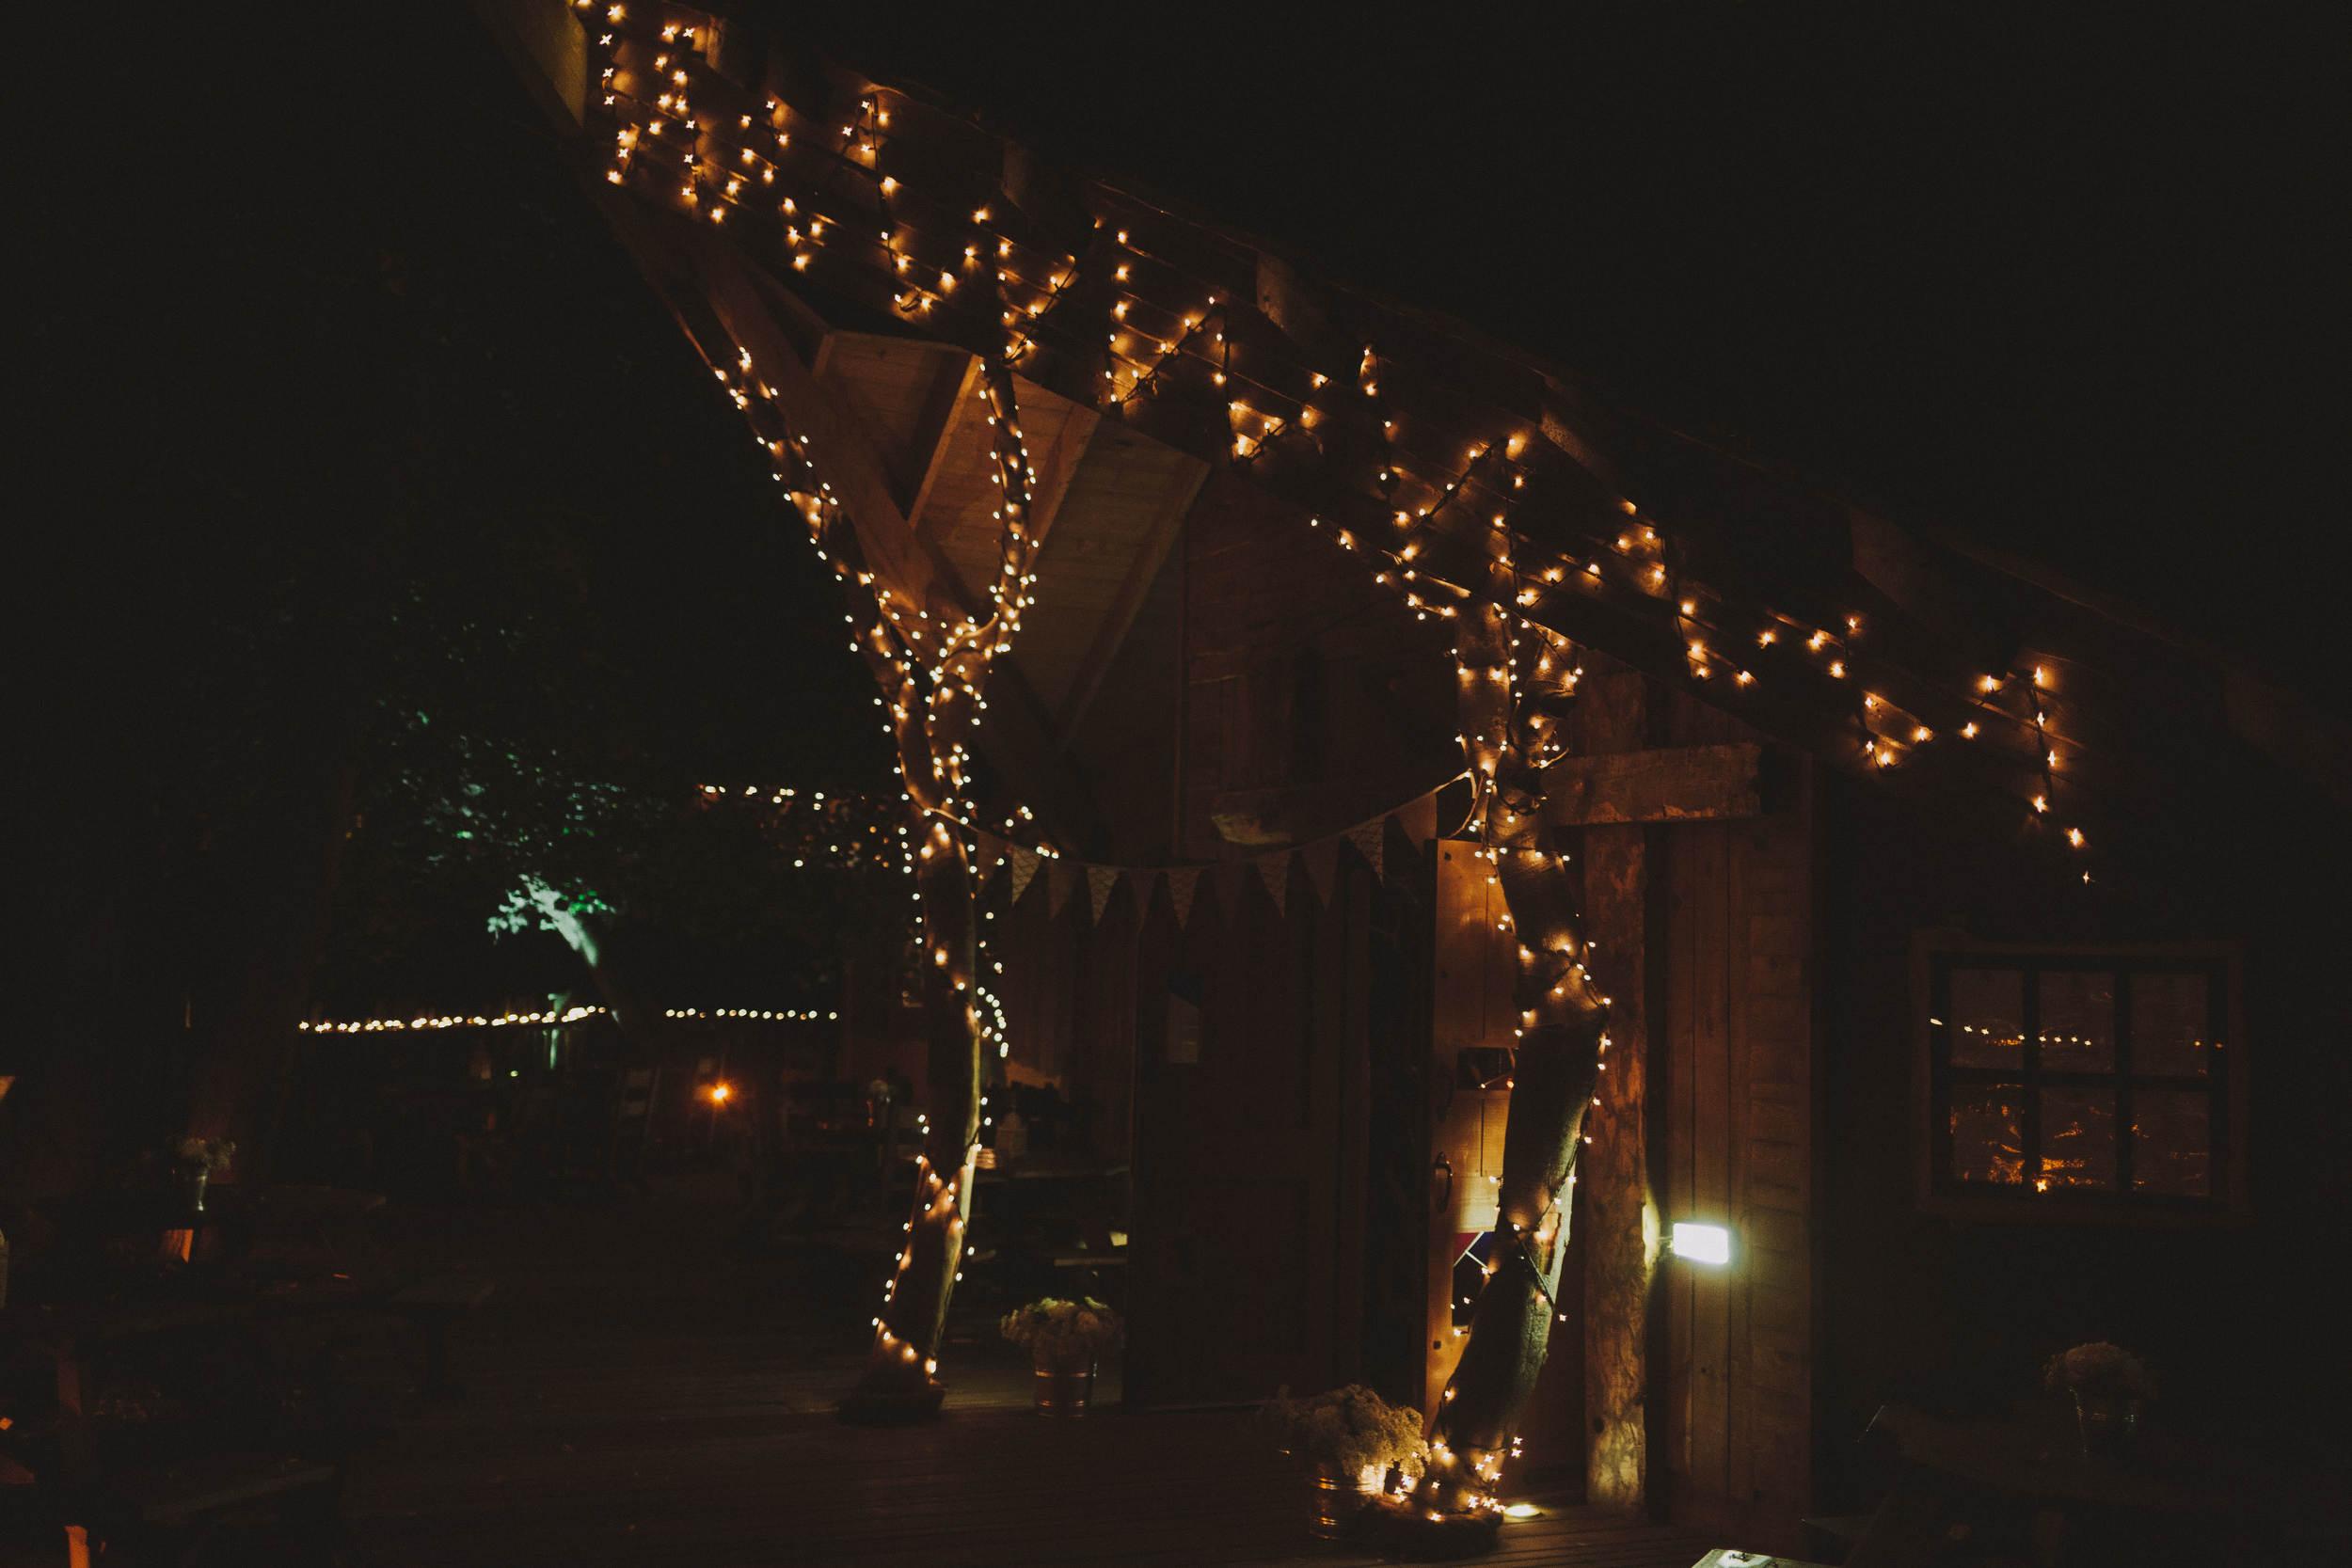 Alnwick Garden Treehouse Lights at night